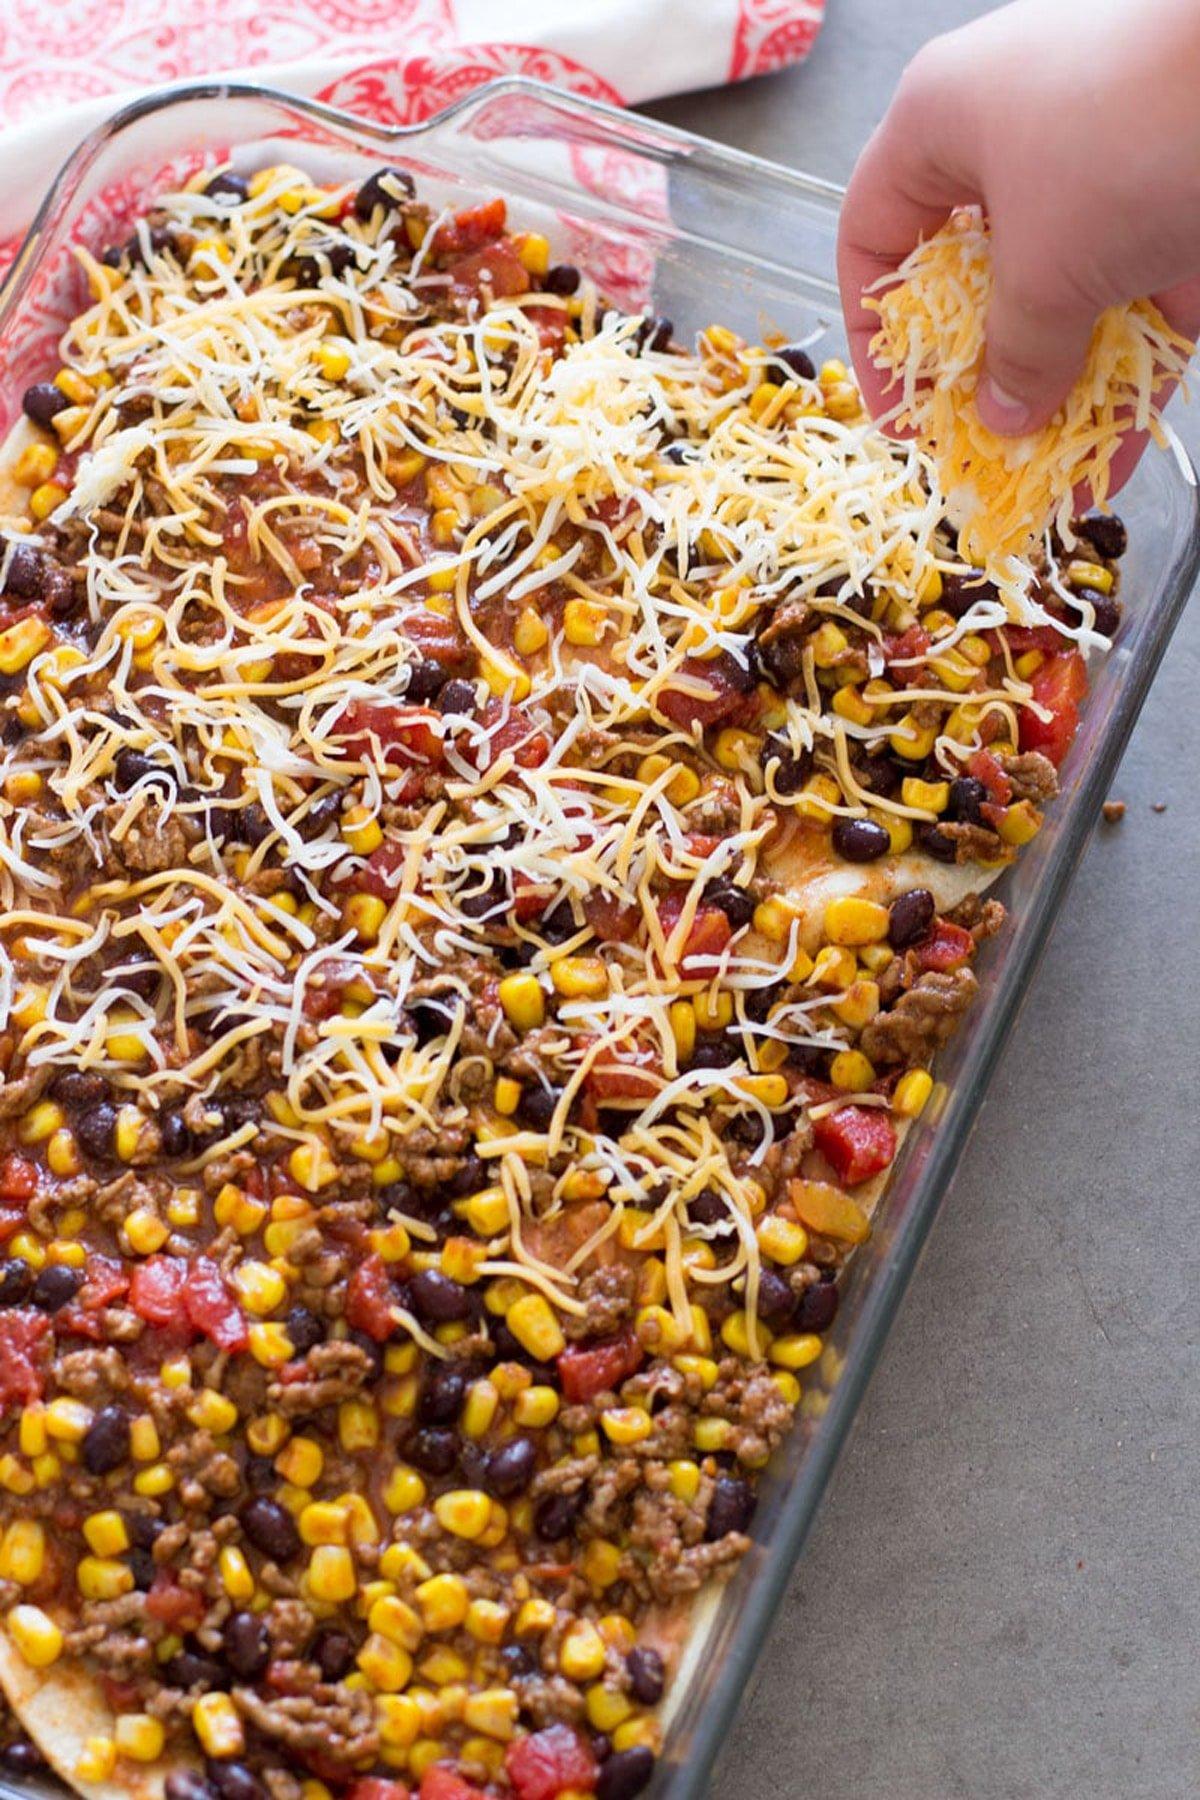 Person adding shredded cheese to enchilada casserole.